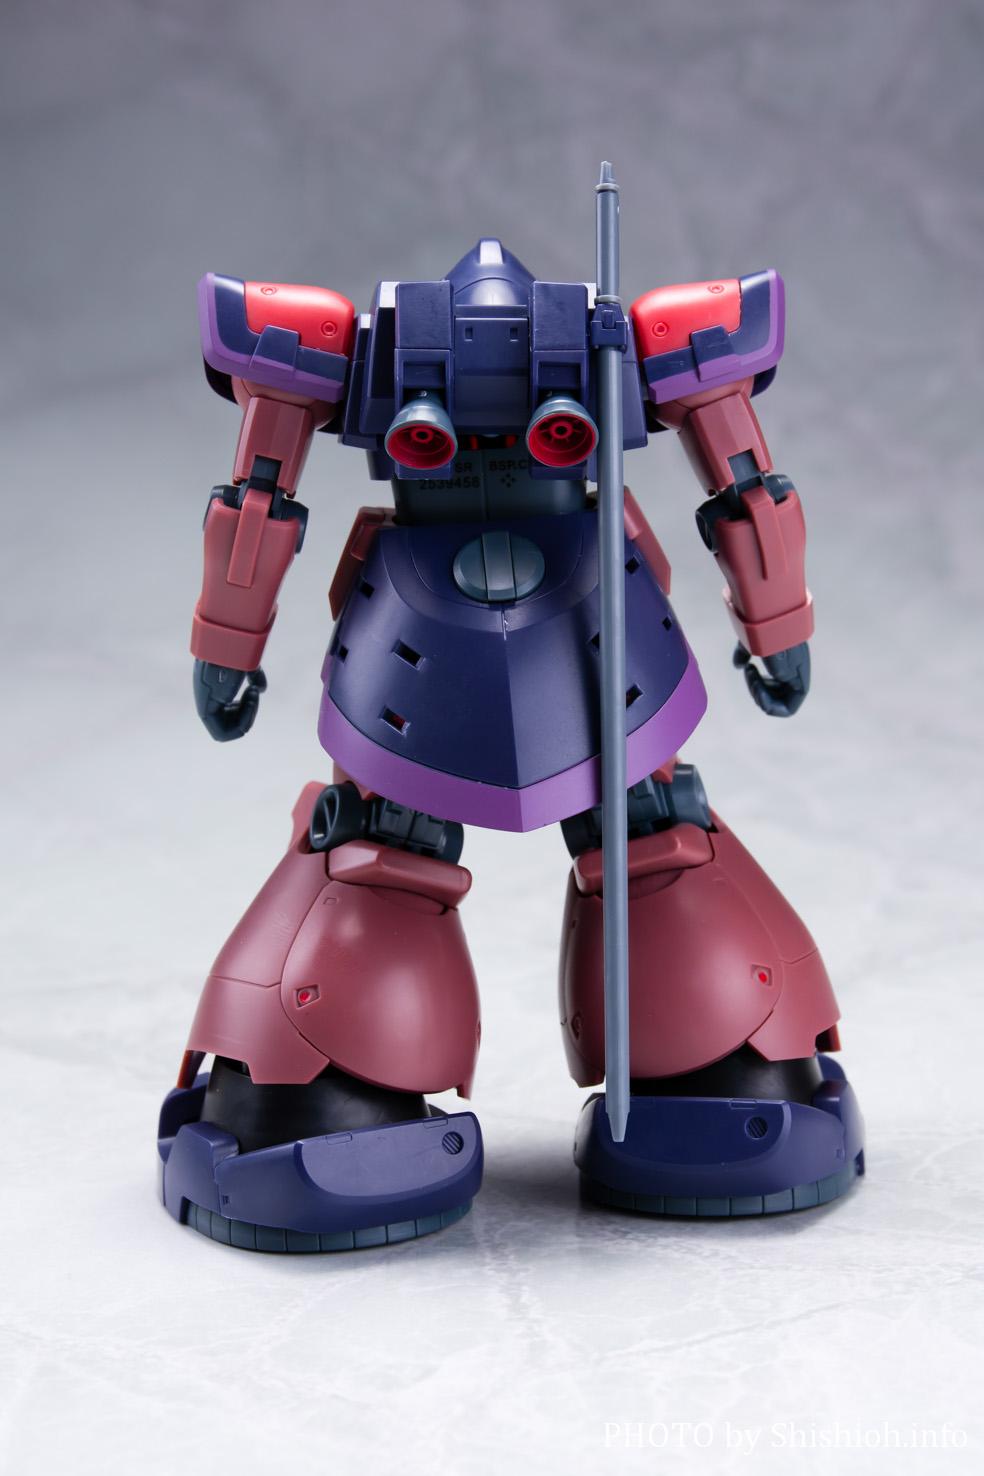 ROBOT魂 プロトタイプ・リック・ドムII ver. A.N.I.M.E.